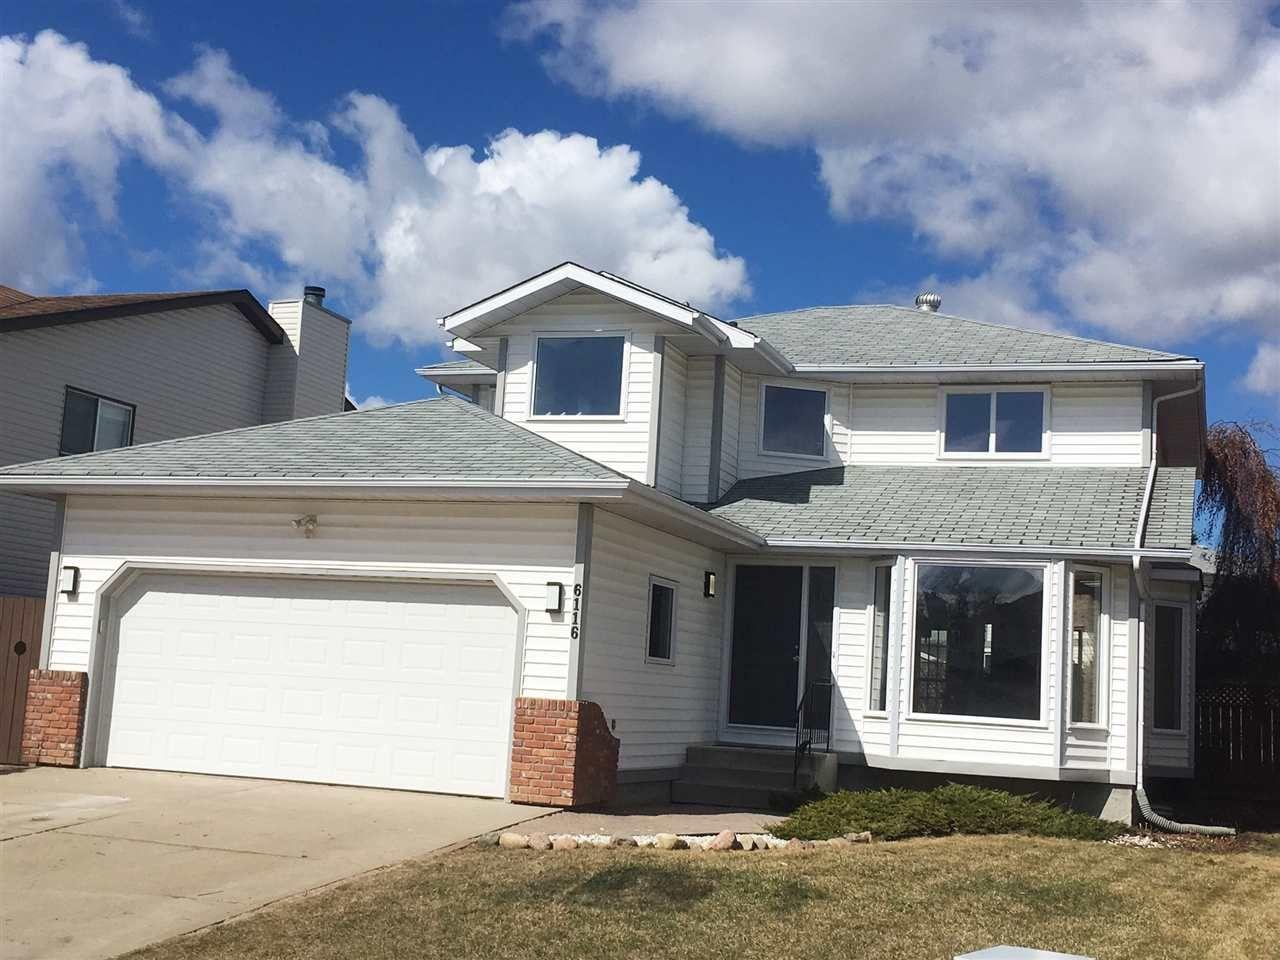 Main Photo: 6116 152C Avenue in Edmonton: Zone 02 House for sale : MLS®# E4237309